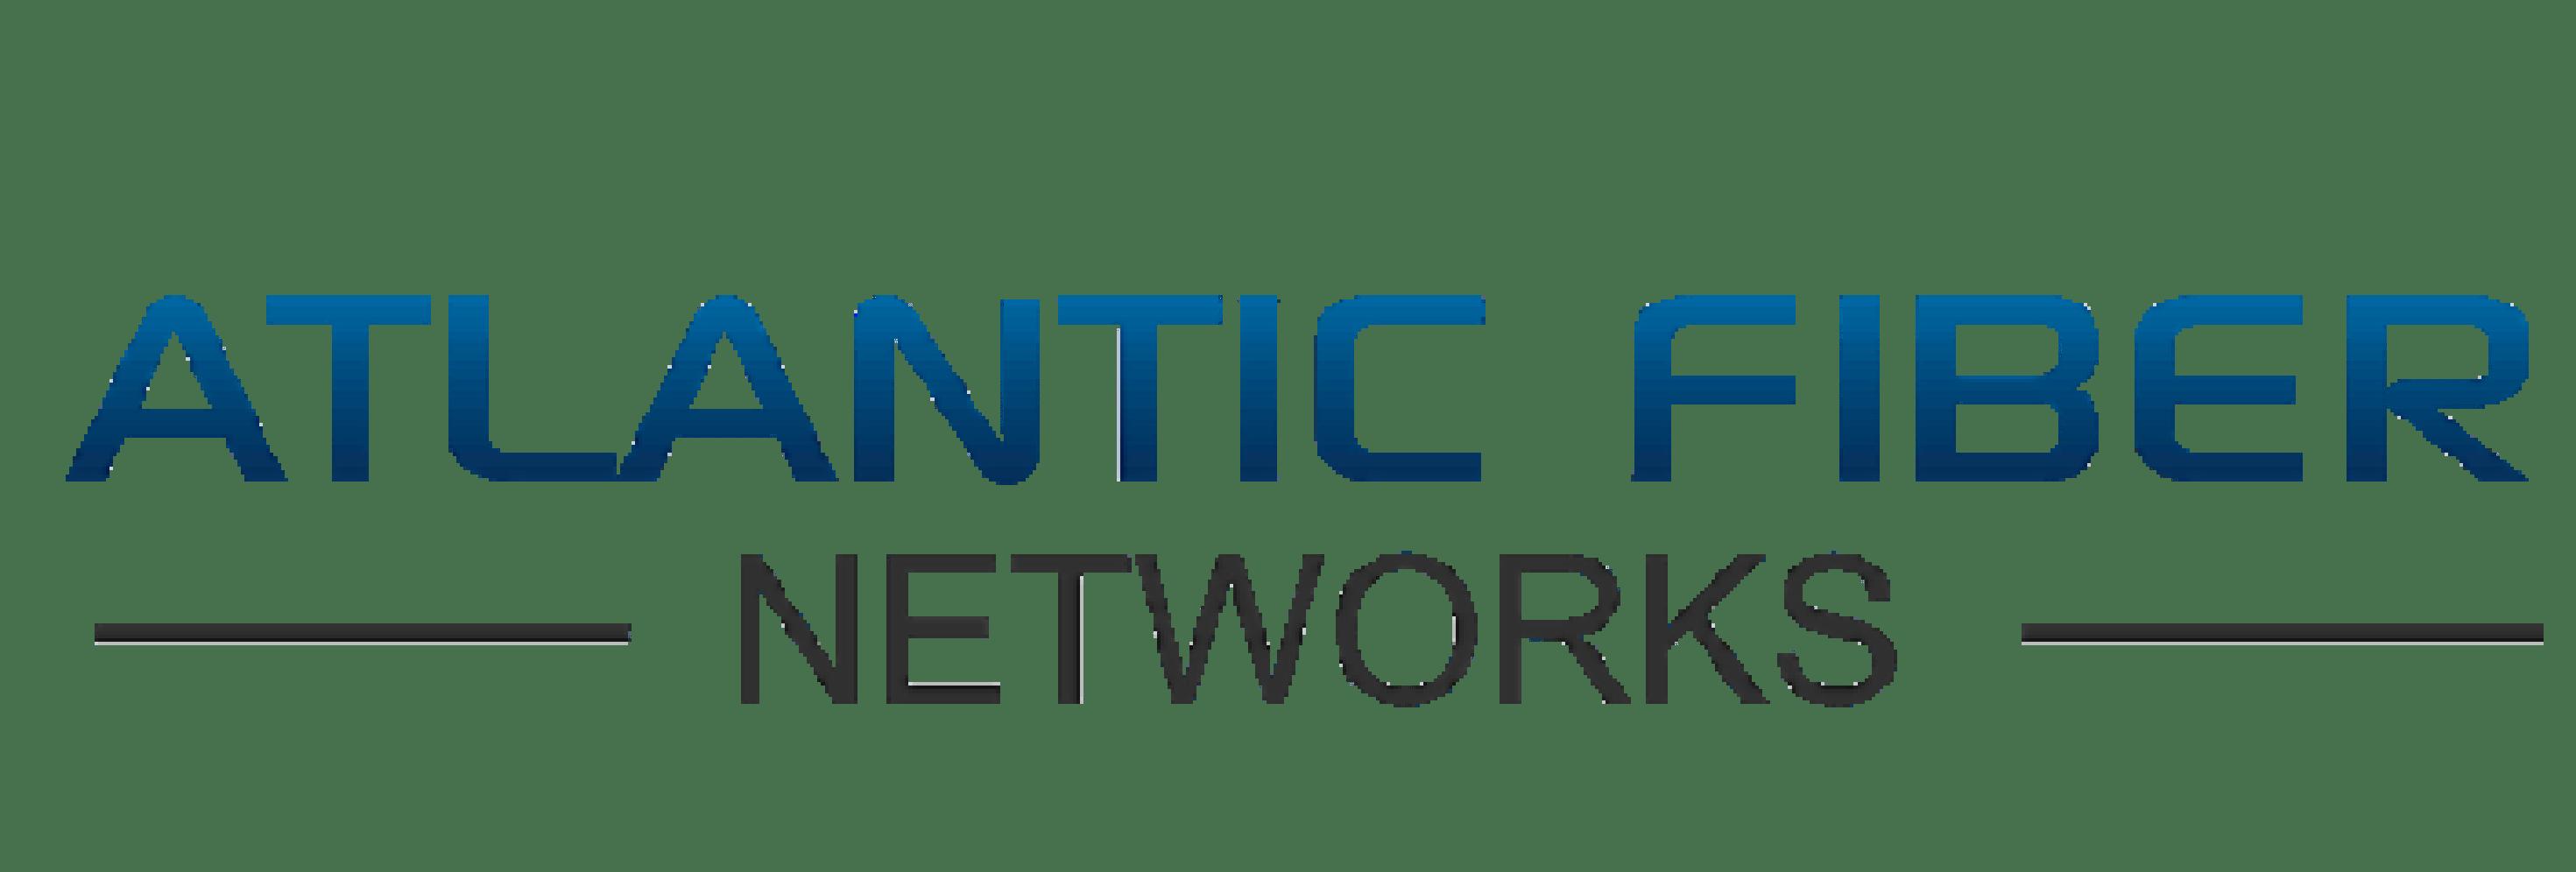 Atlantic Fiber Networks logo